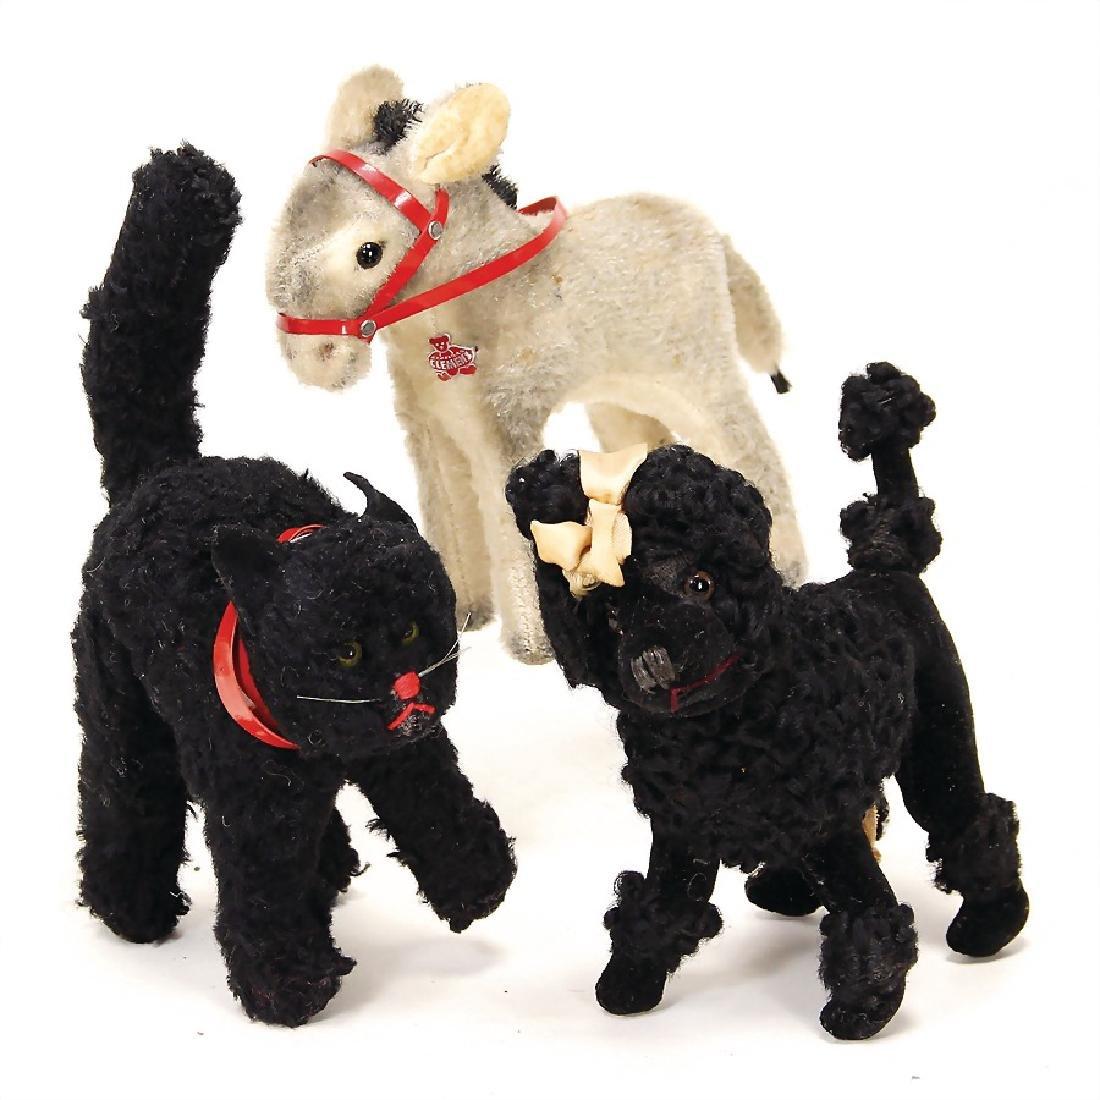 3 cuddly toys, poodle, England, height: 14 cm, donkey,